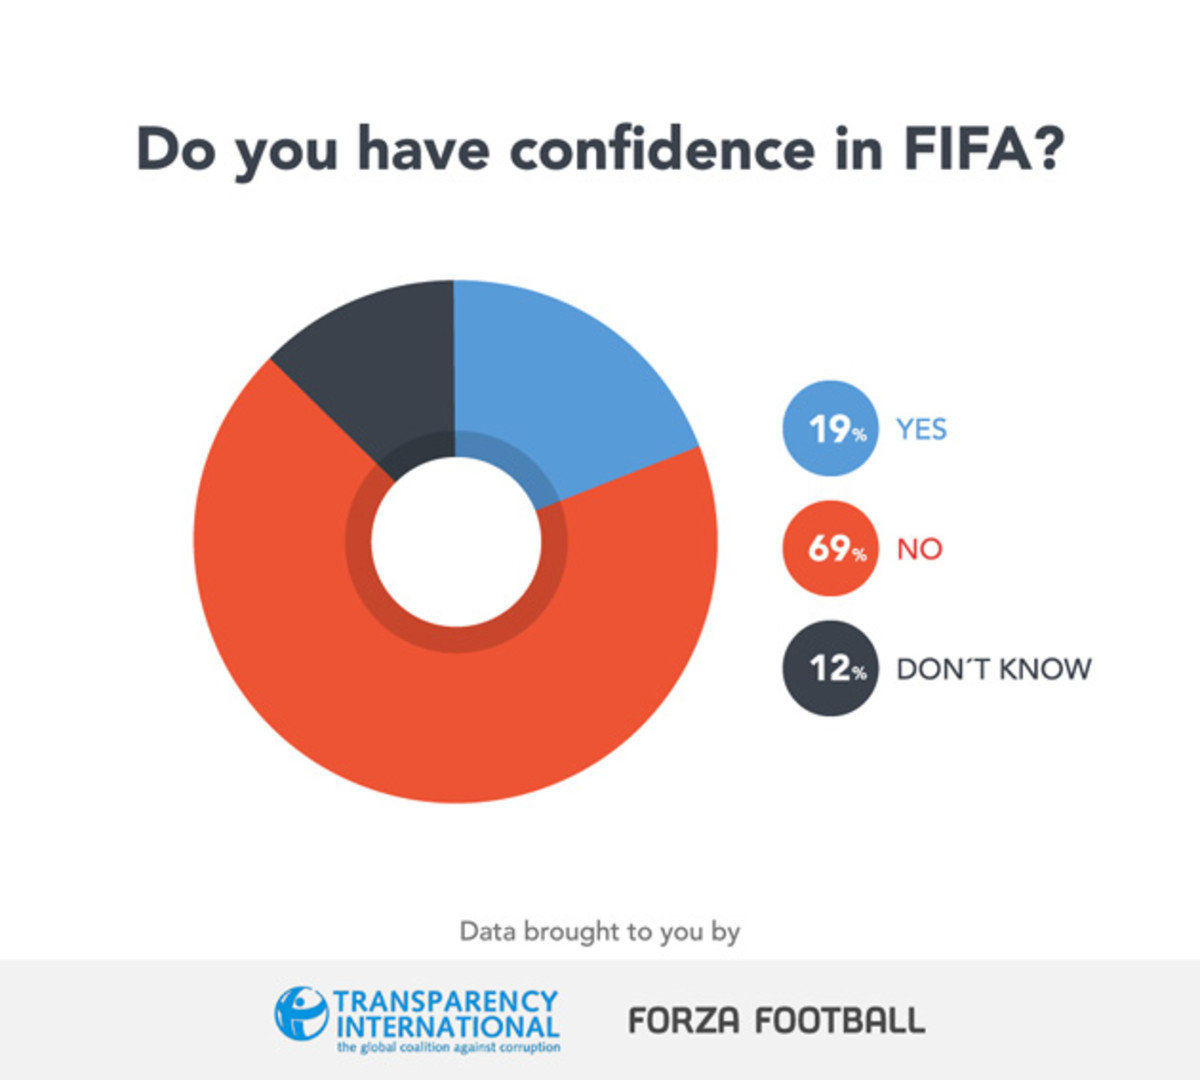 fifa-confidence-2.jpg